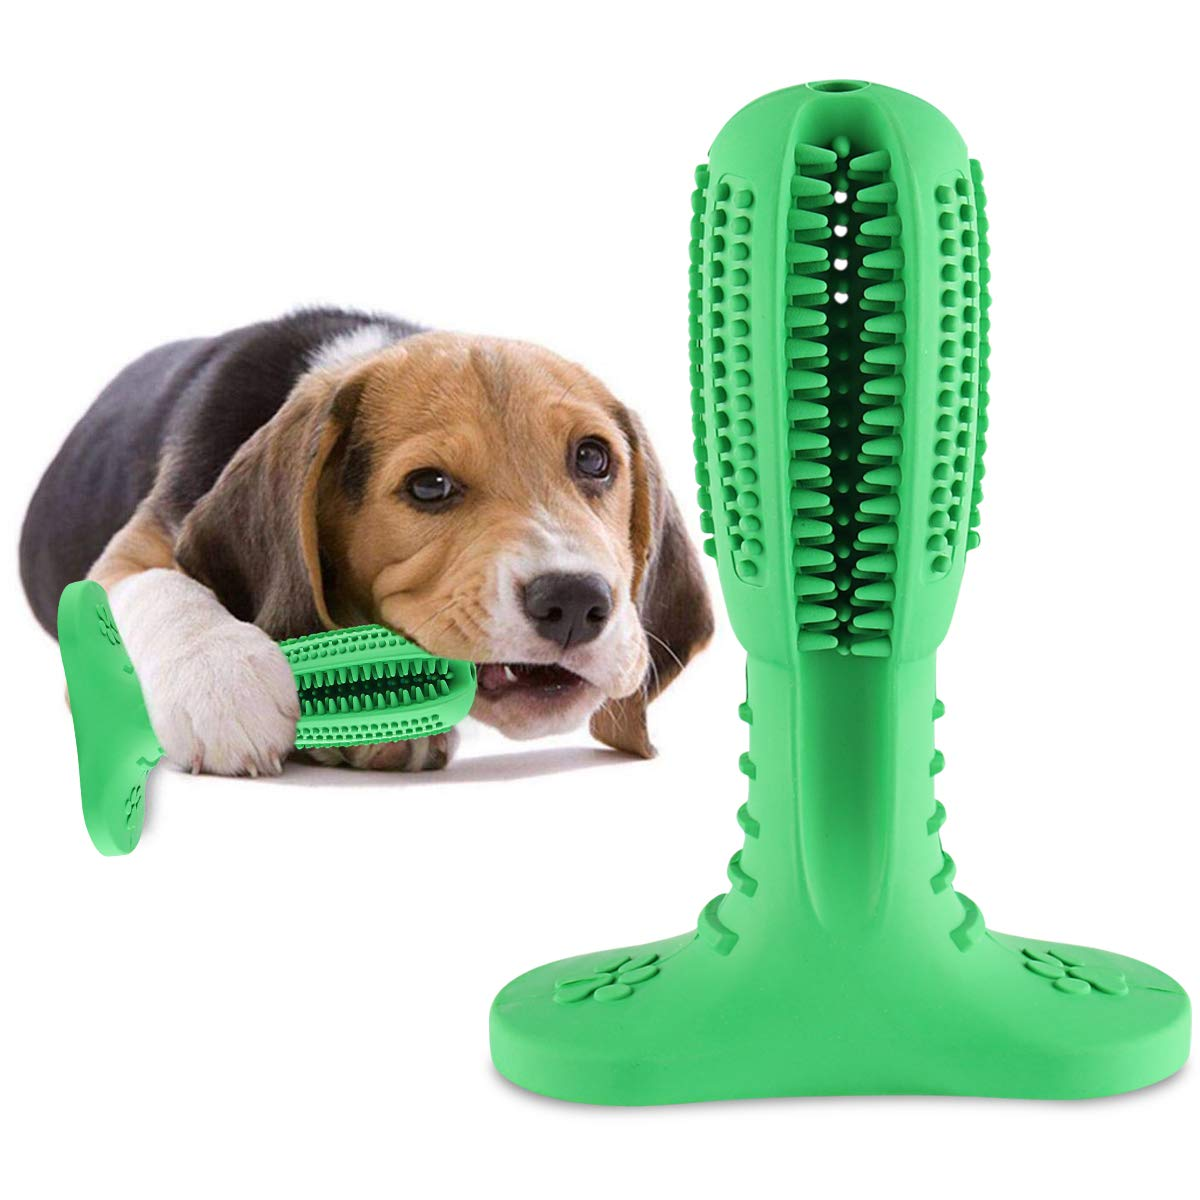 Juguete masticable para perros.